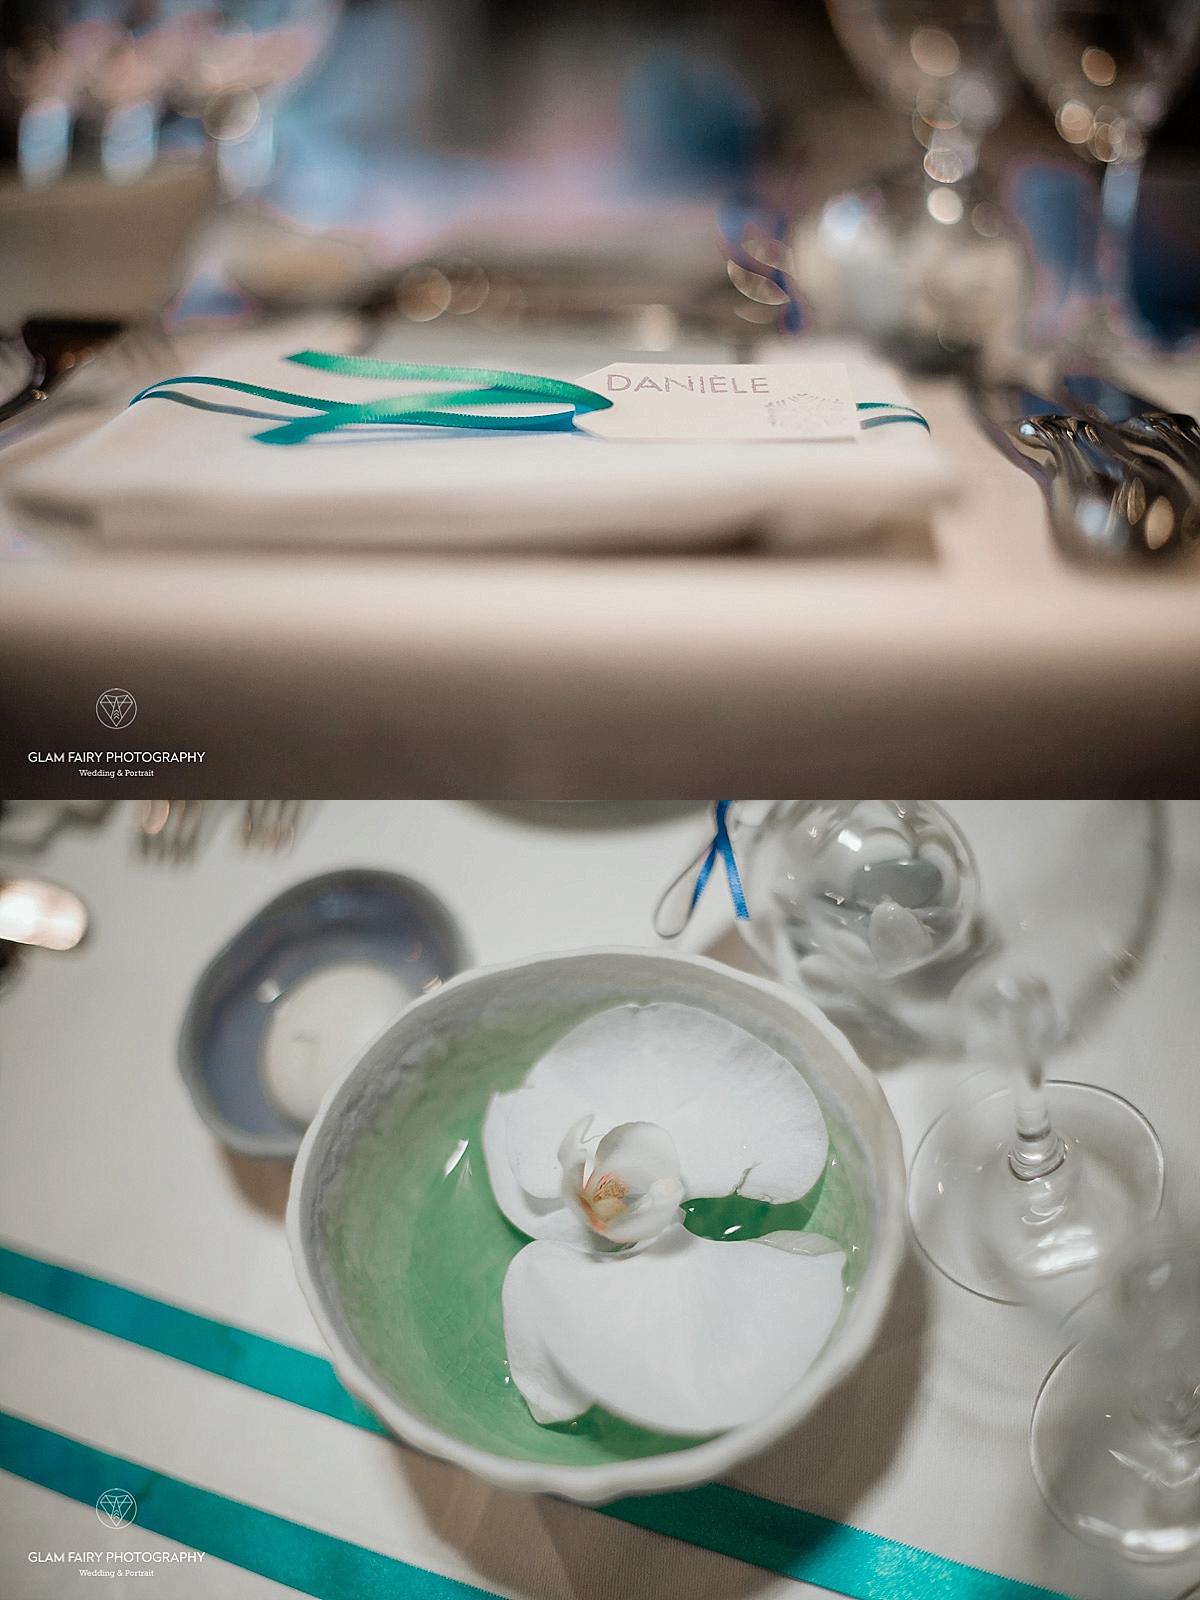 GlamFairyPhotography-mariage-hiver-pressigny-les-pins-aryz_0033